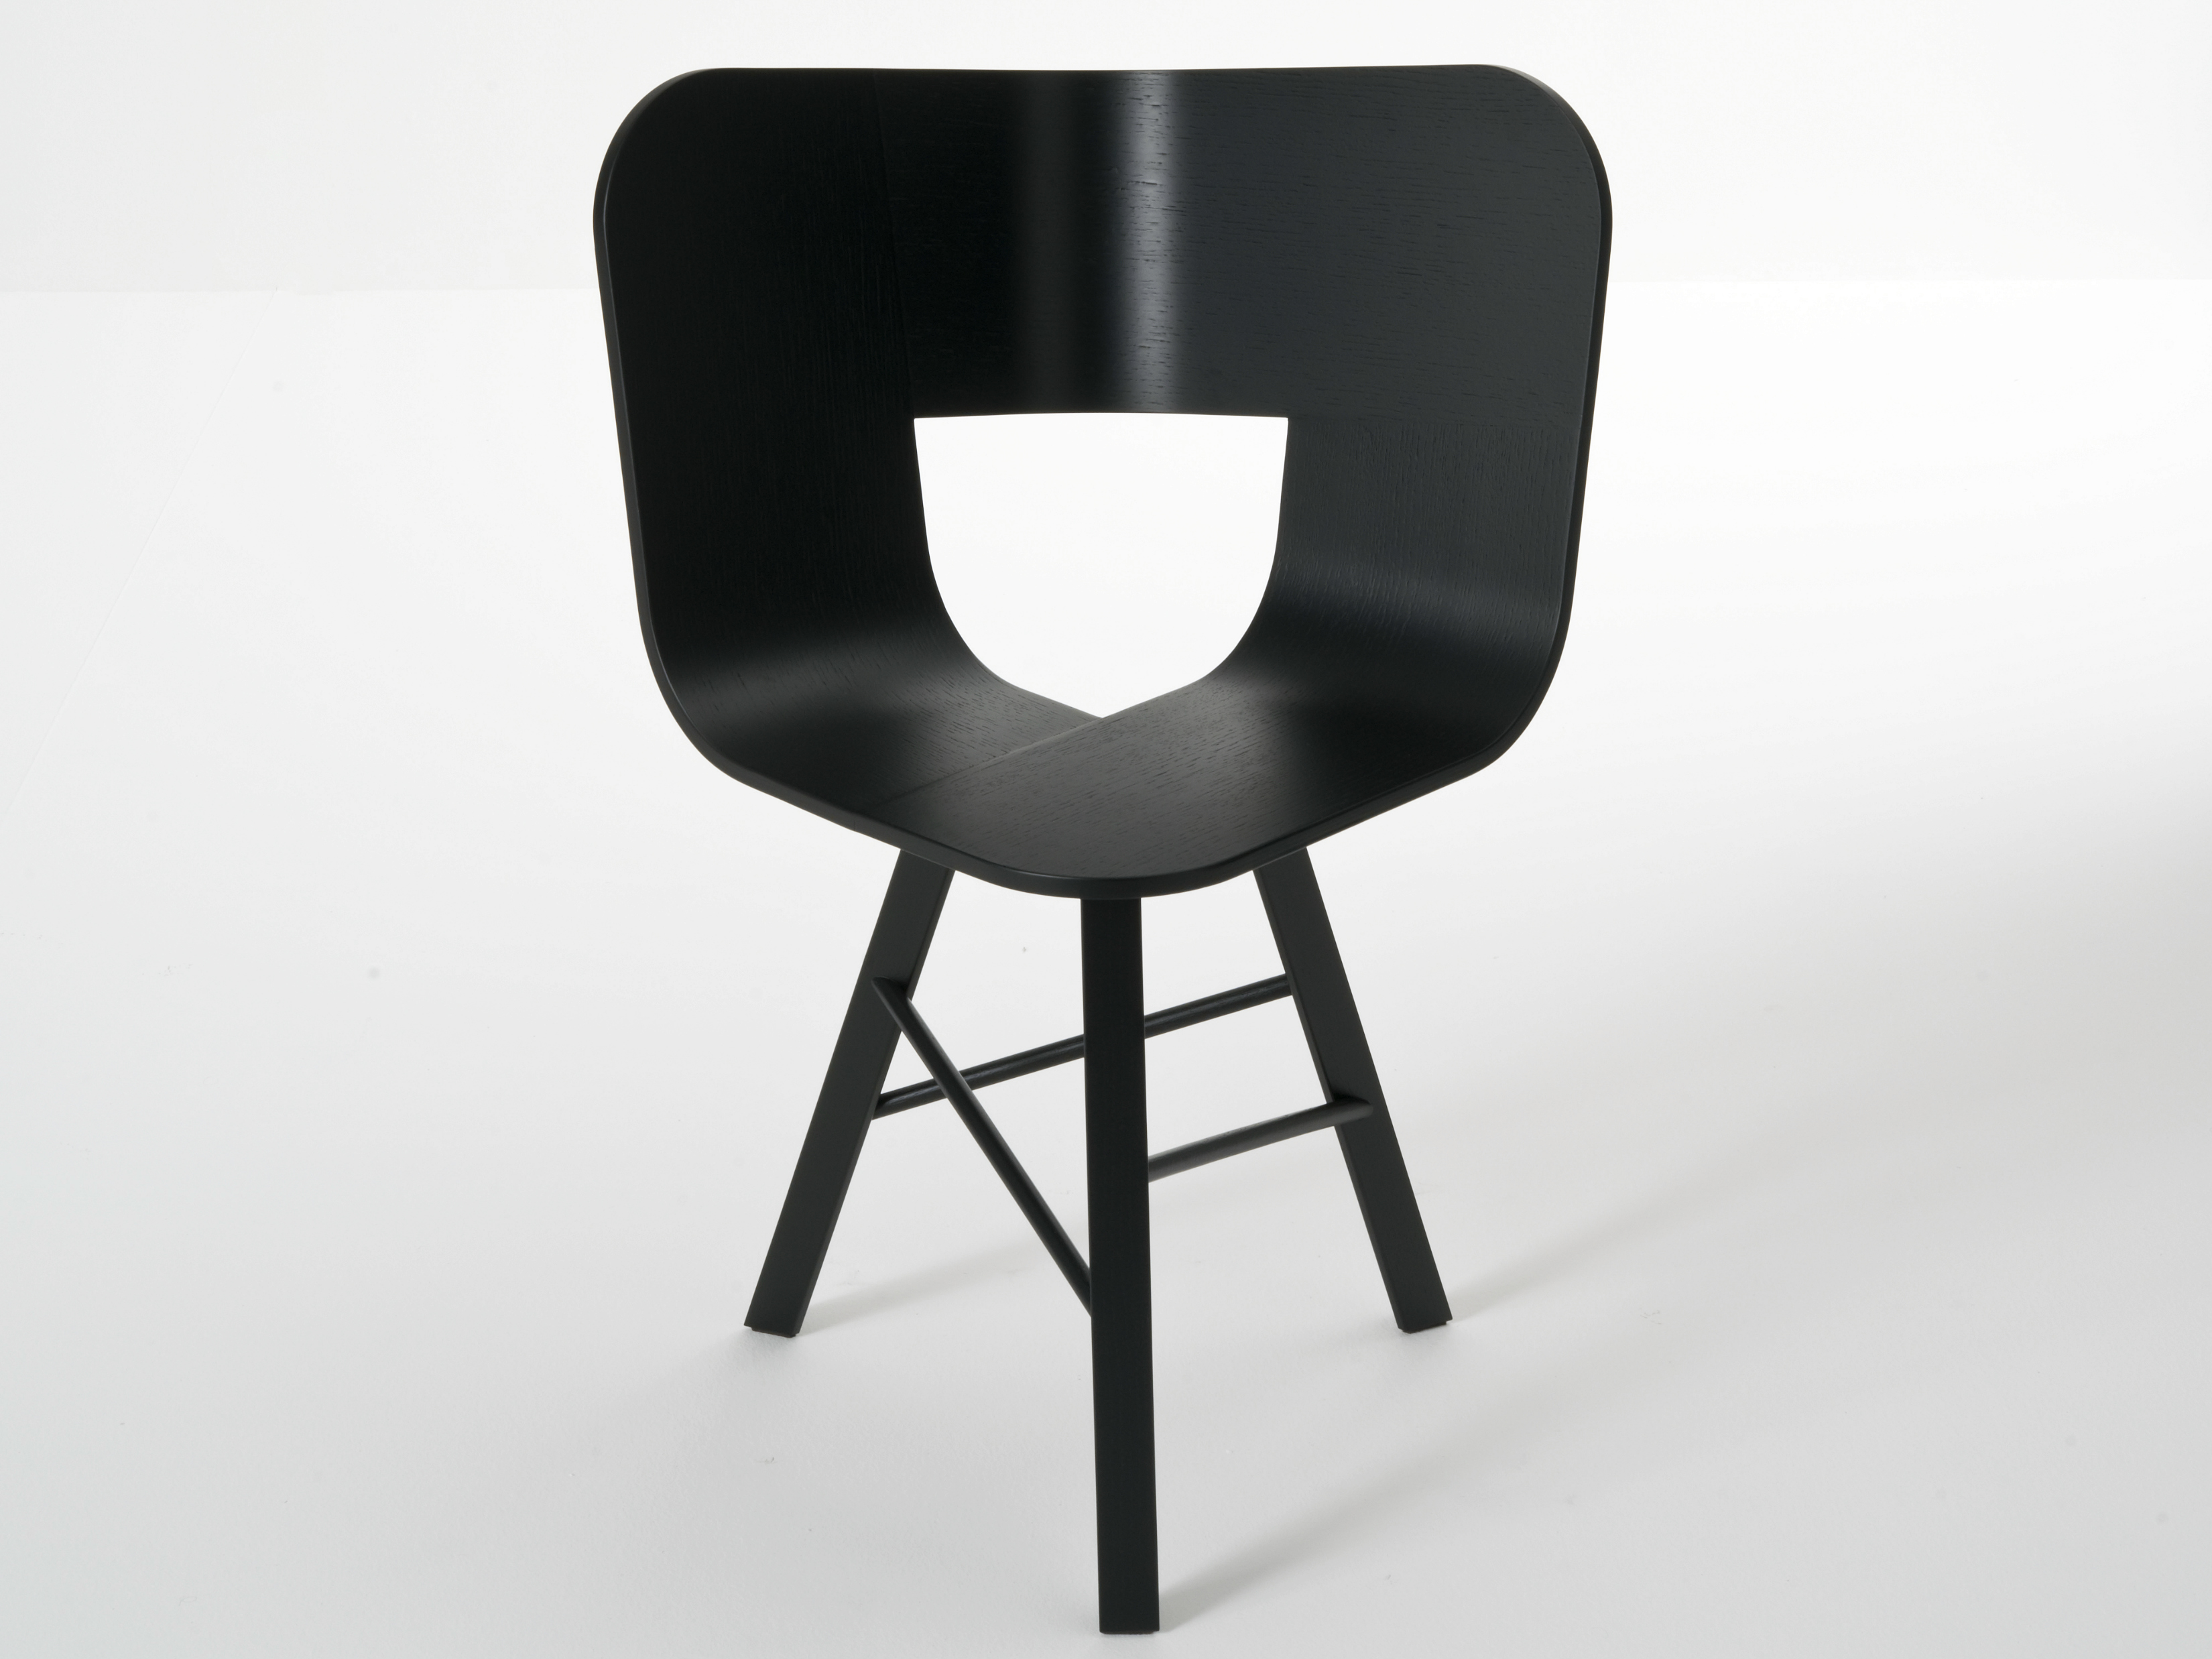 TRIA WOOD | Chair By Colé Italia design Lorenz+Kaz - TS32 - Black open pore, legs painted black